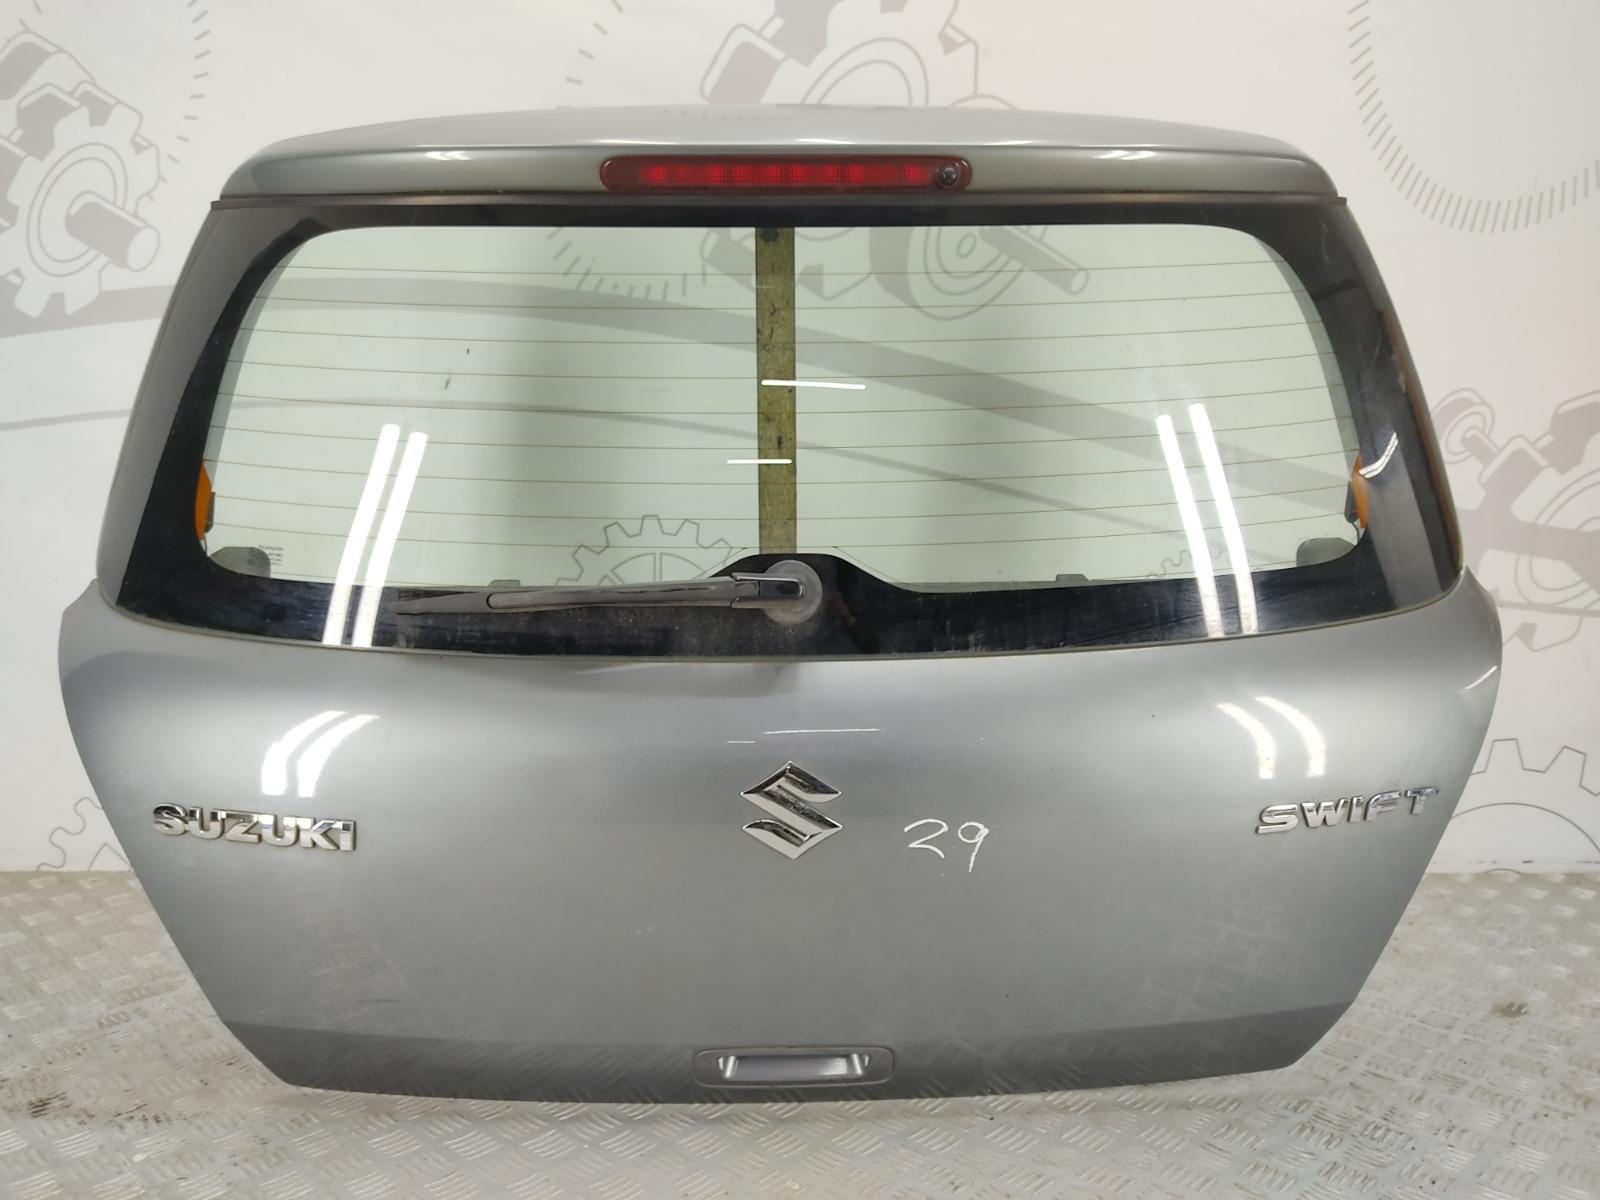 Крышка багажника Suzuki Swift 1.3 I 2006 (б/у)